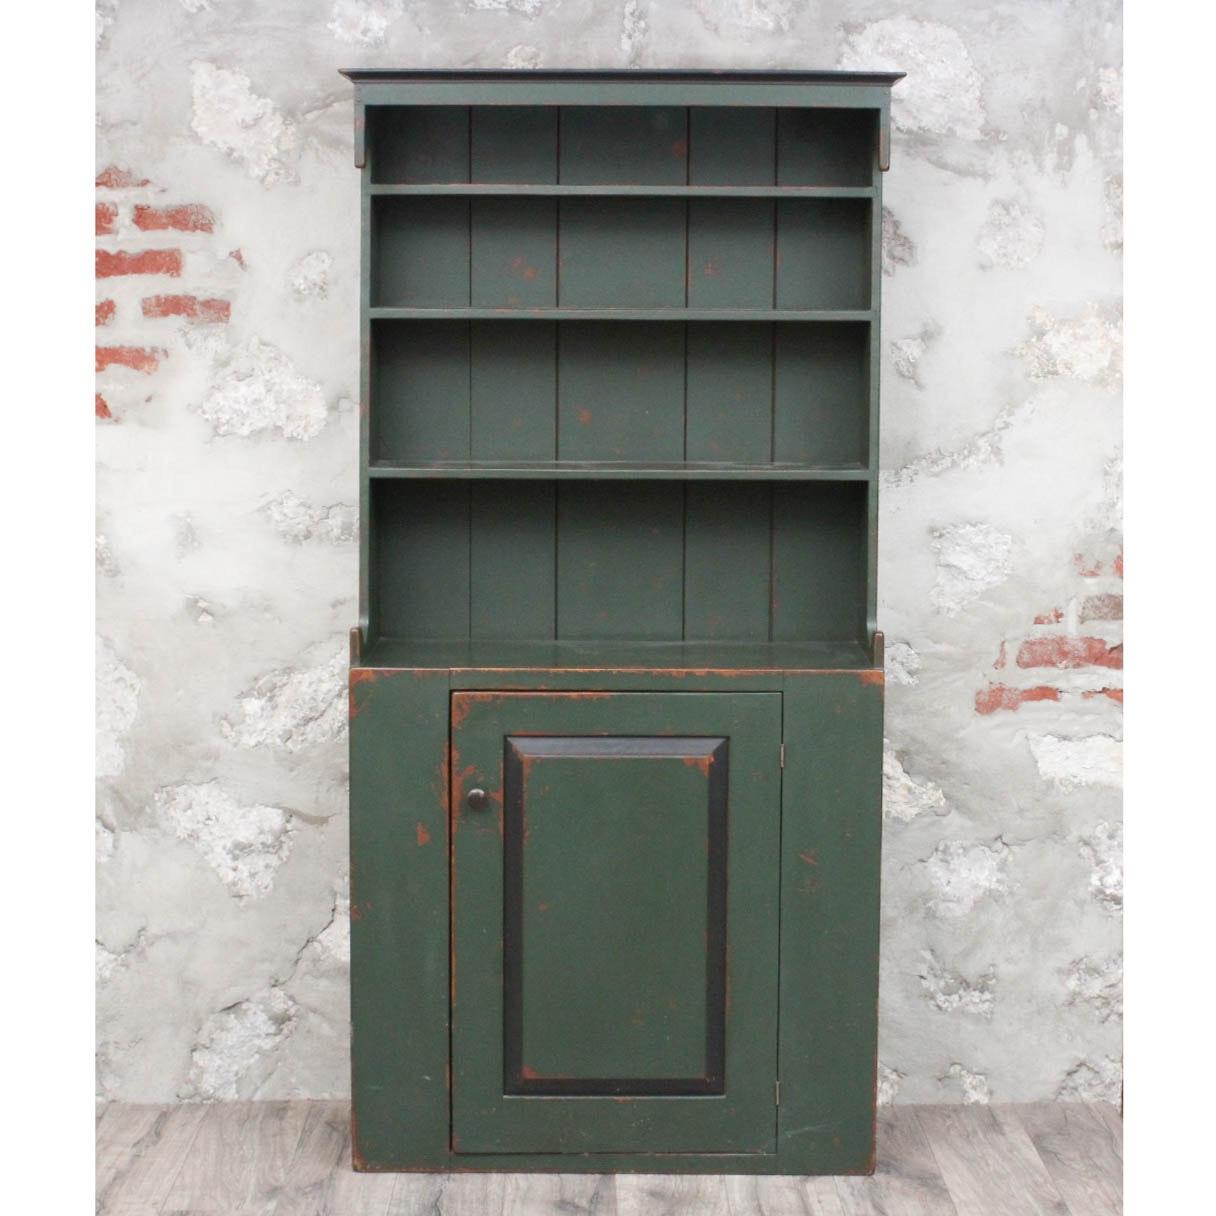 Primitive Style Stepback Cupboard in Green Paint